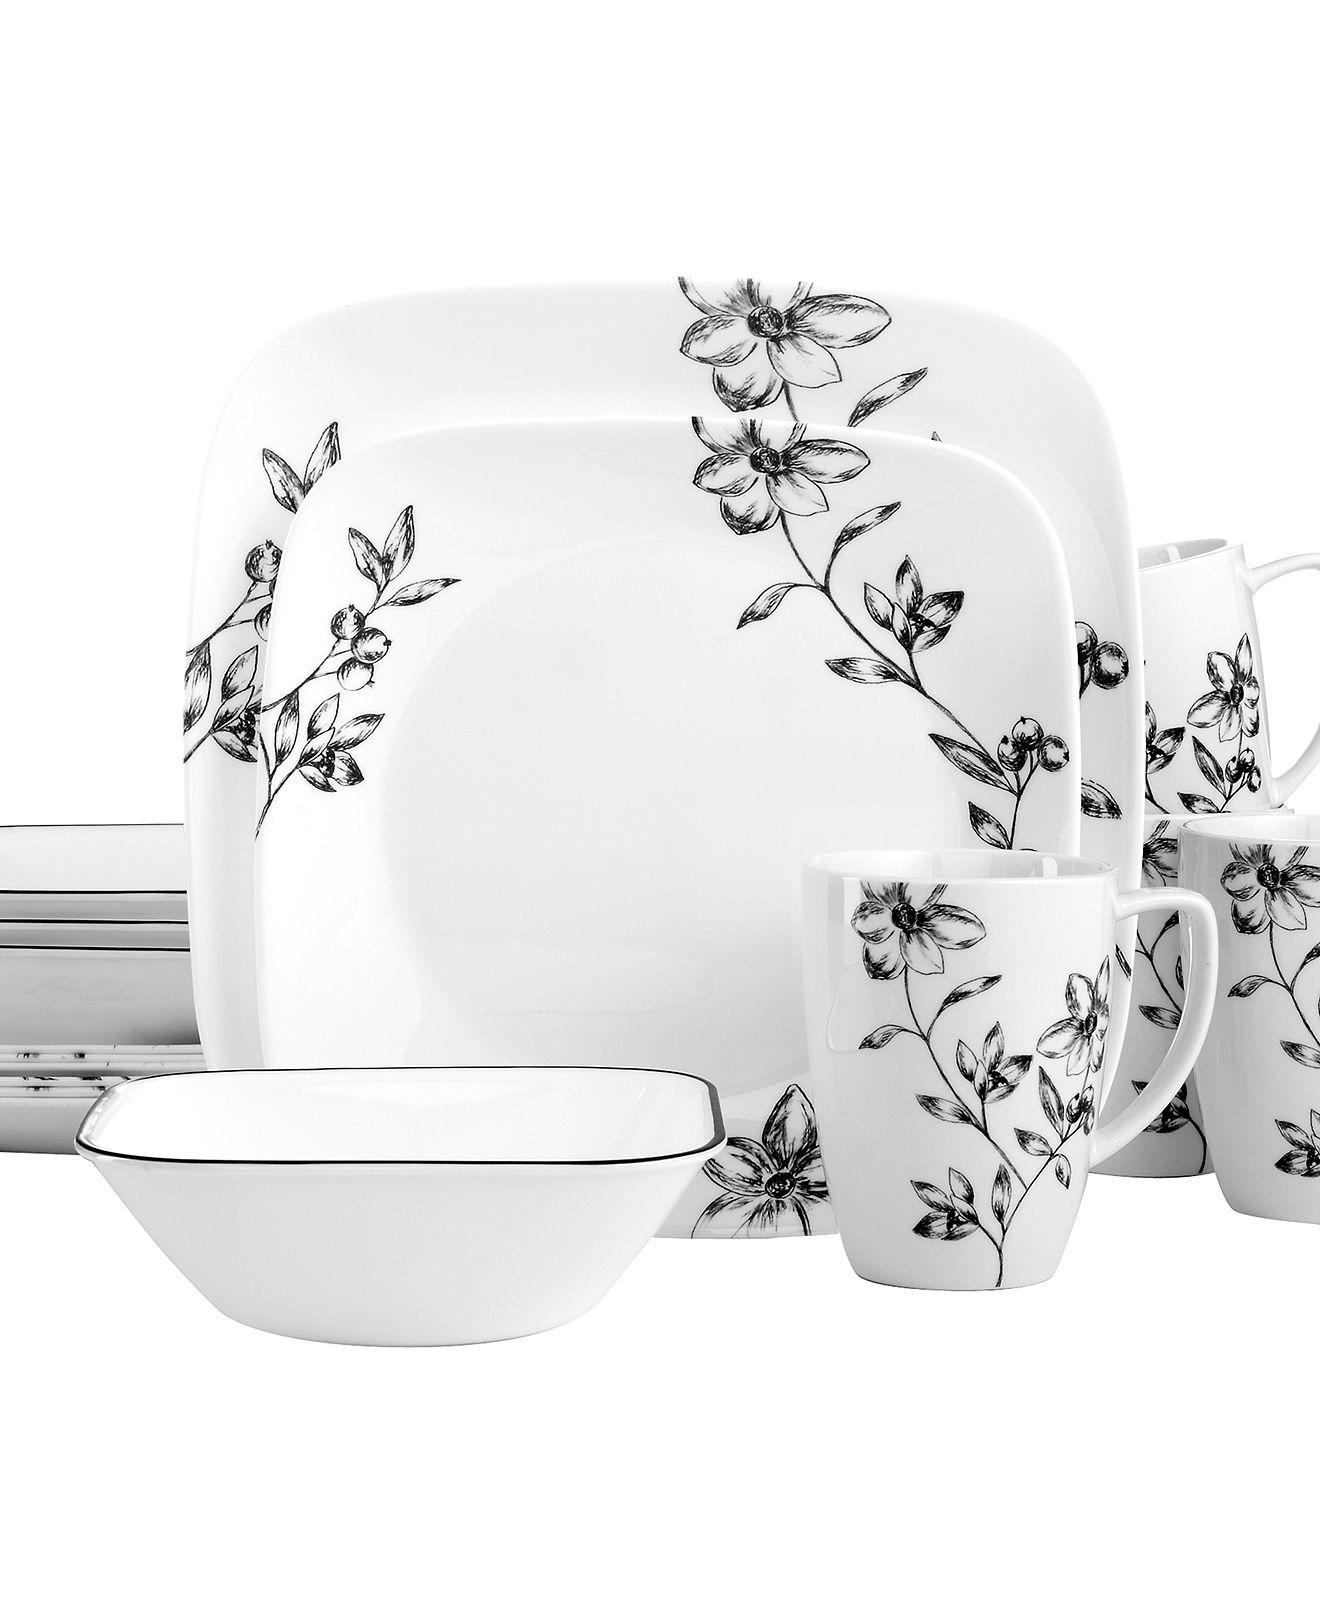 White apron macy's -  Corelle Favourite Fleur Dinnerware Set Macys